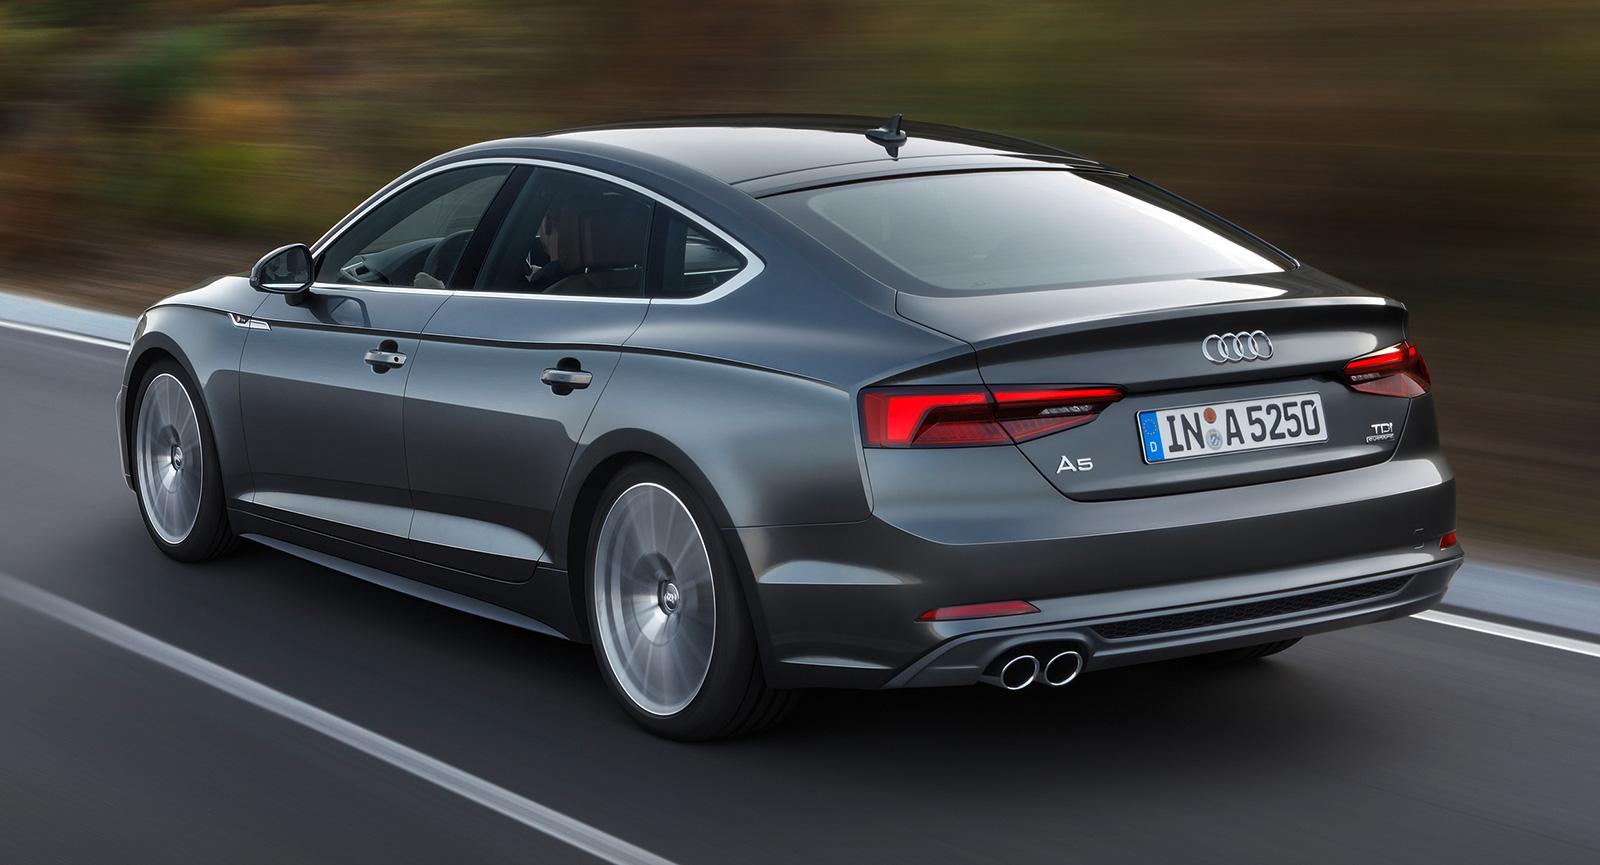 2017 Audi A5 And S5 Sportback Revealed Paris Debut Paul Tan Image